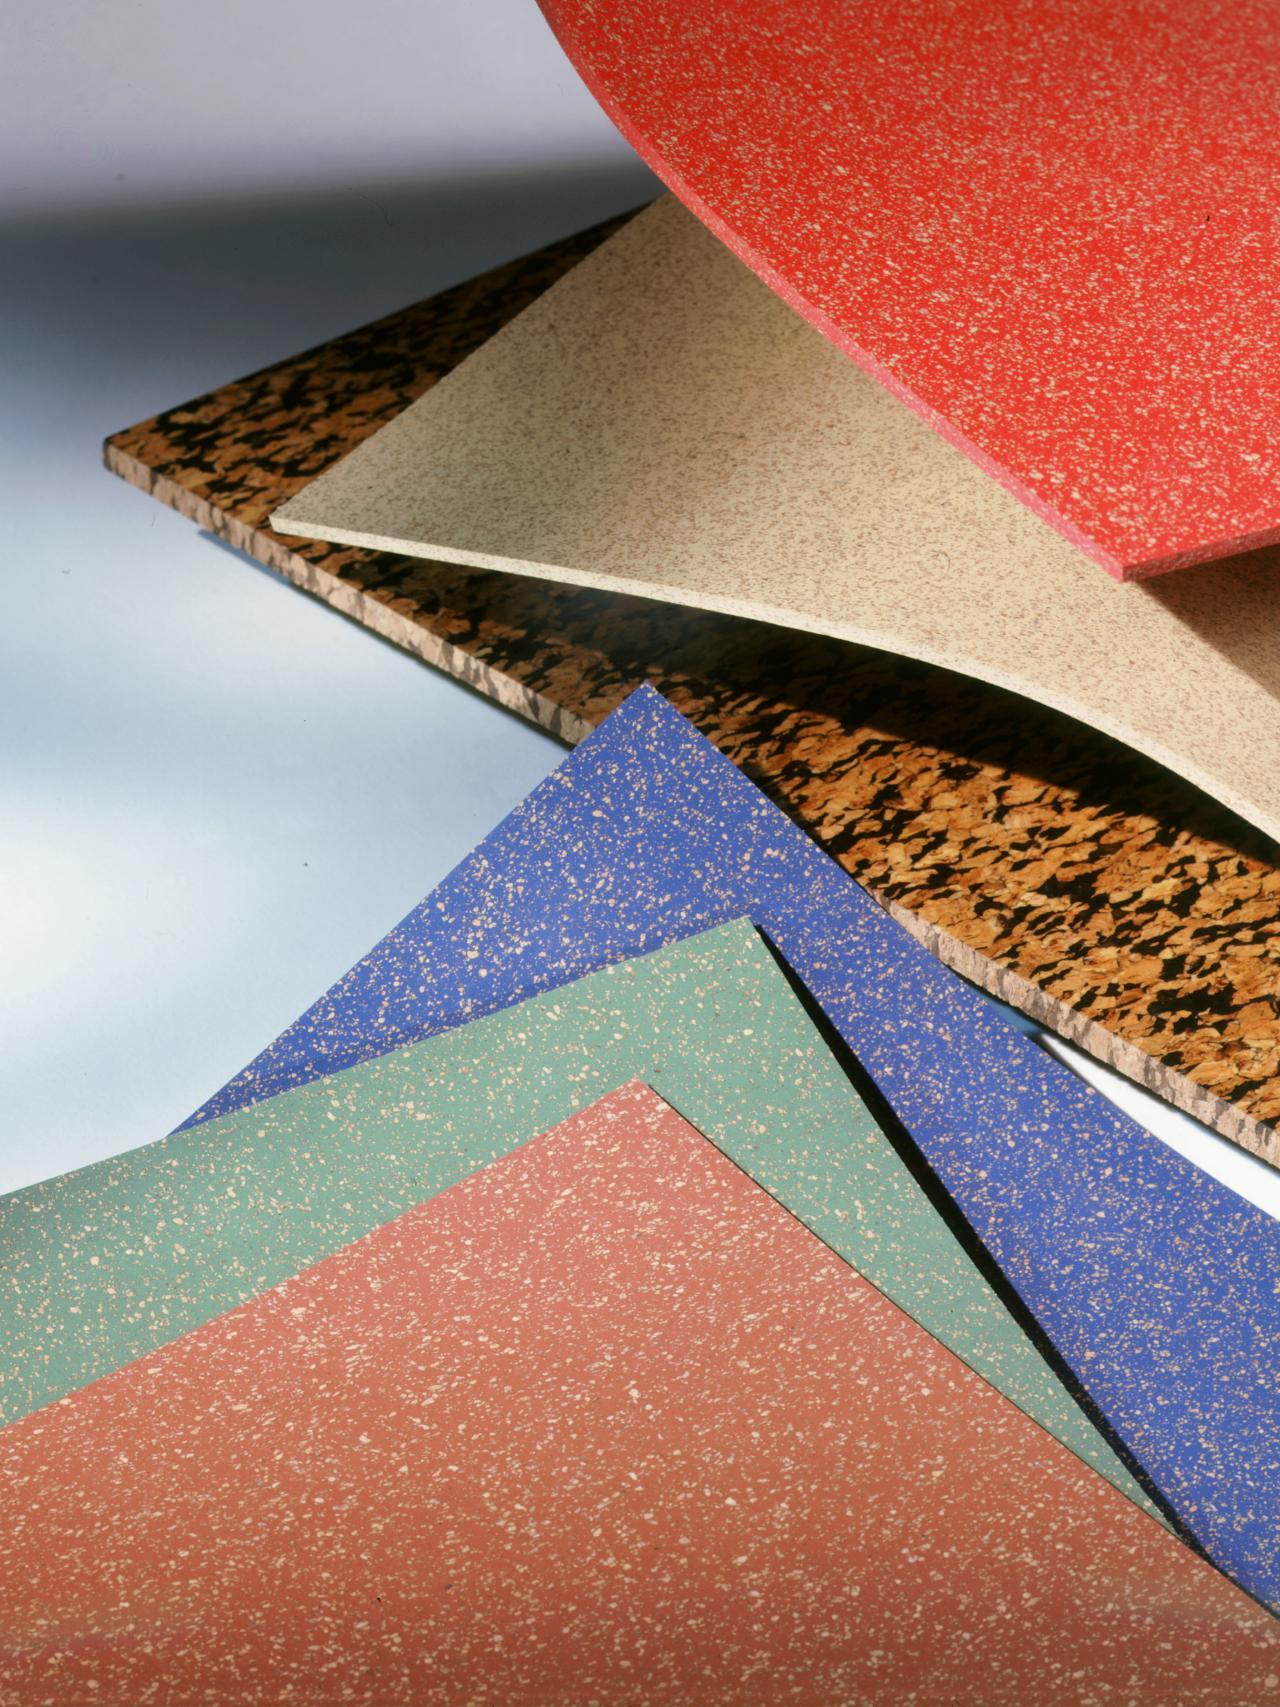 comfortable rubber cork floors alternative kitchen floor ideas   hgtv  rh   hgtv com